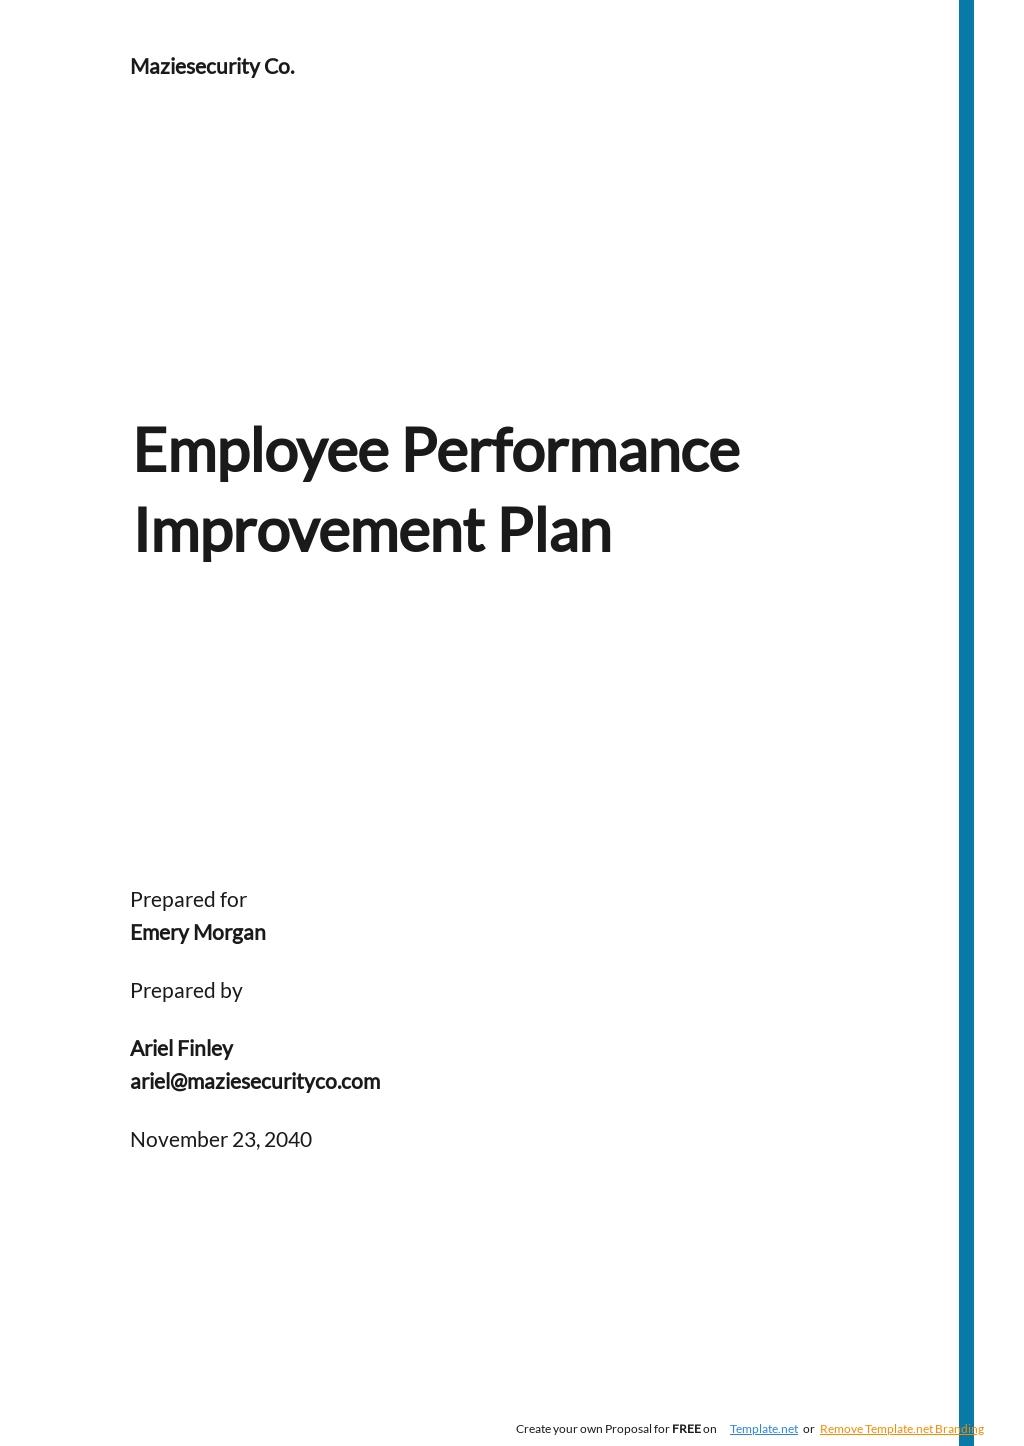 Sample Employee Performance Improvement Plan Template.jpe